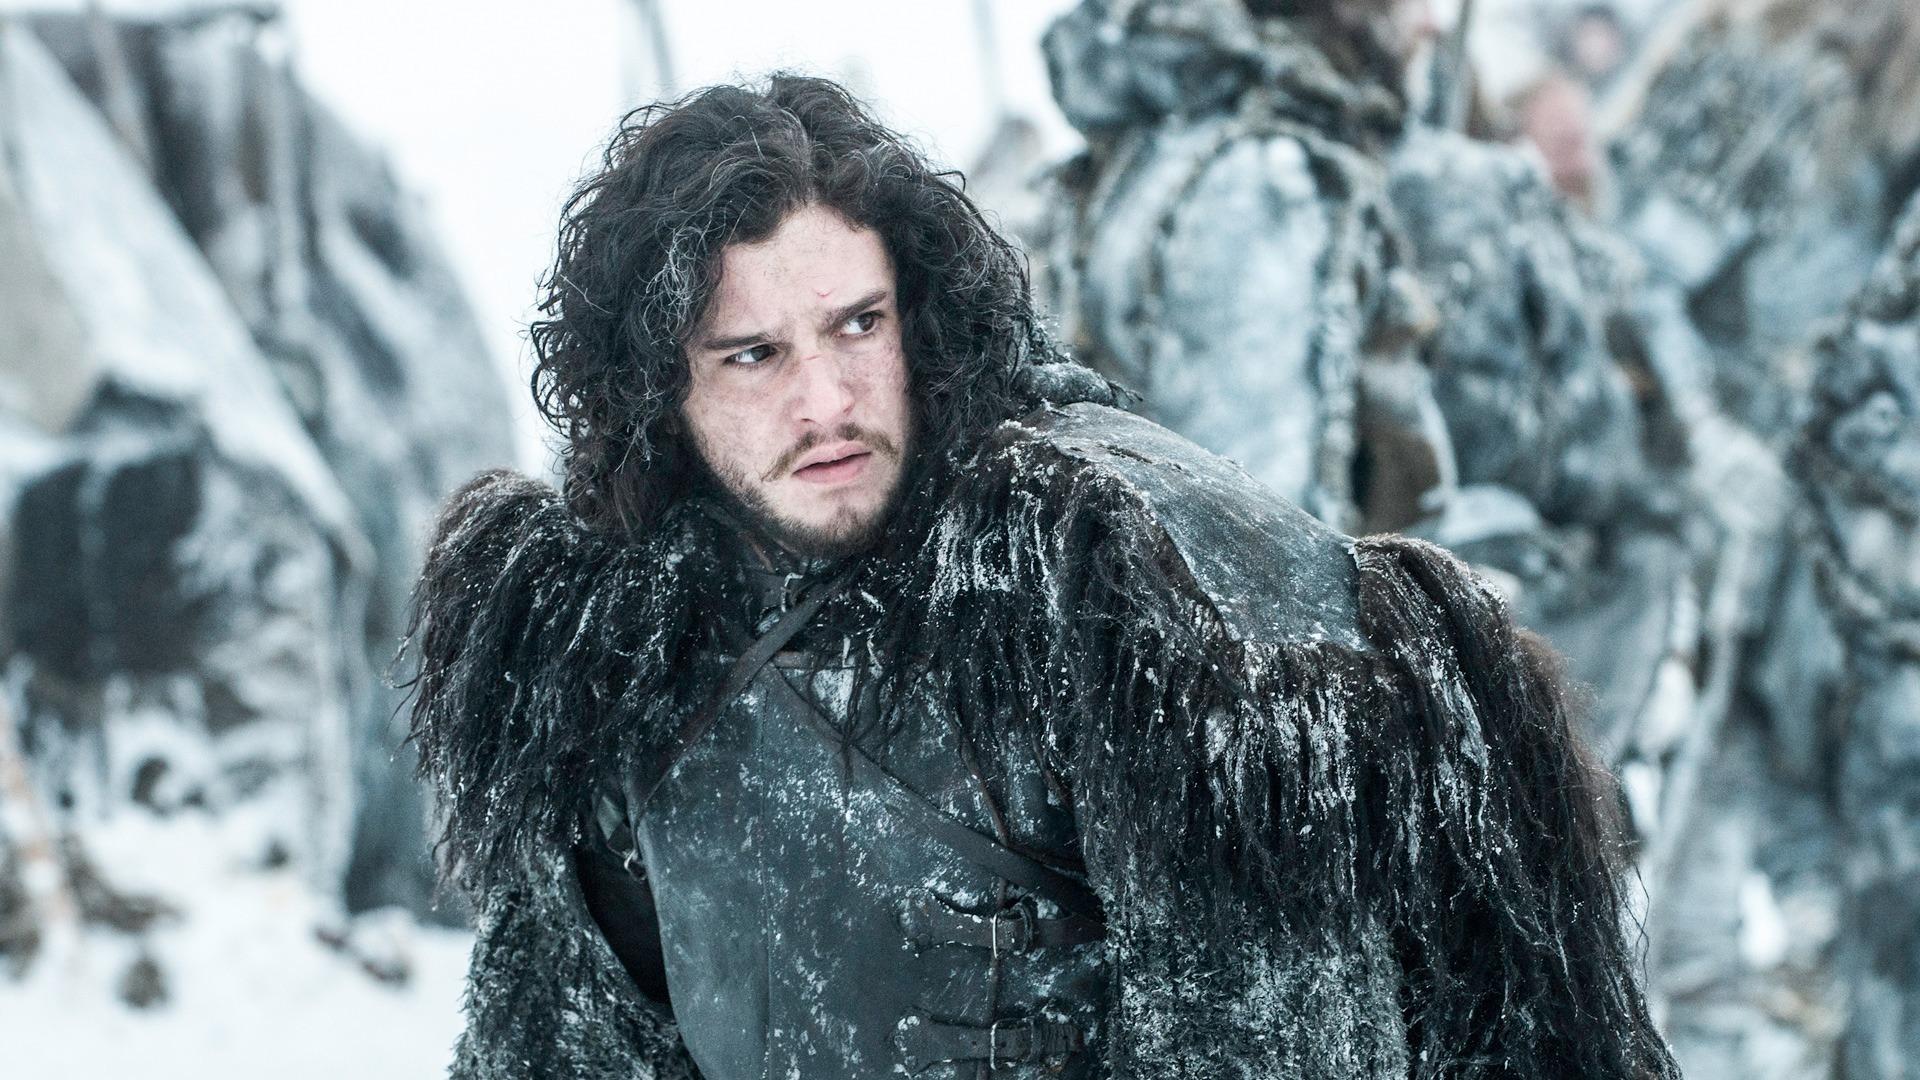 jon snow lord commander of castle black game of thrones 2015